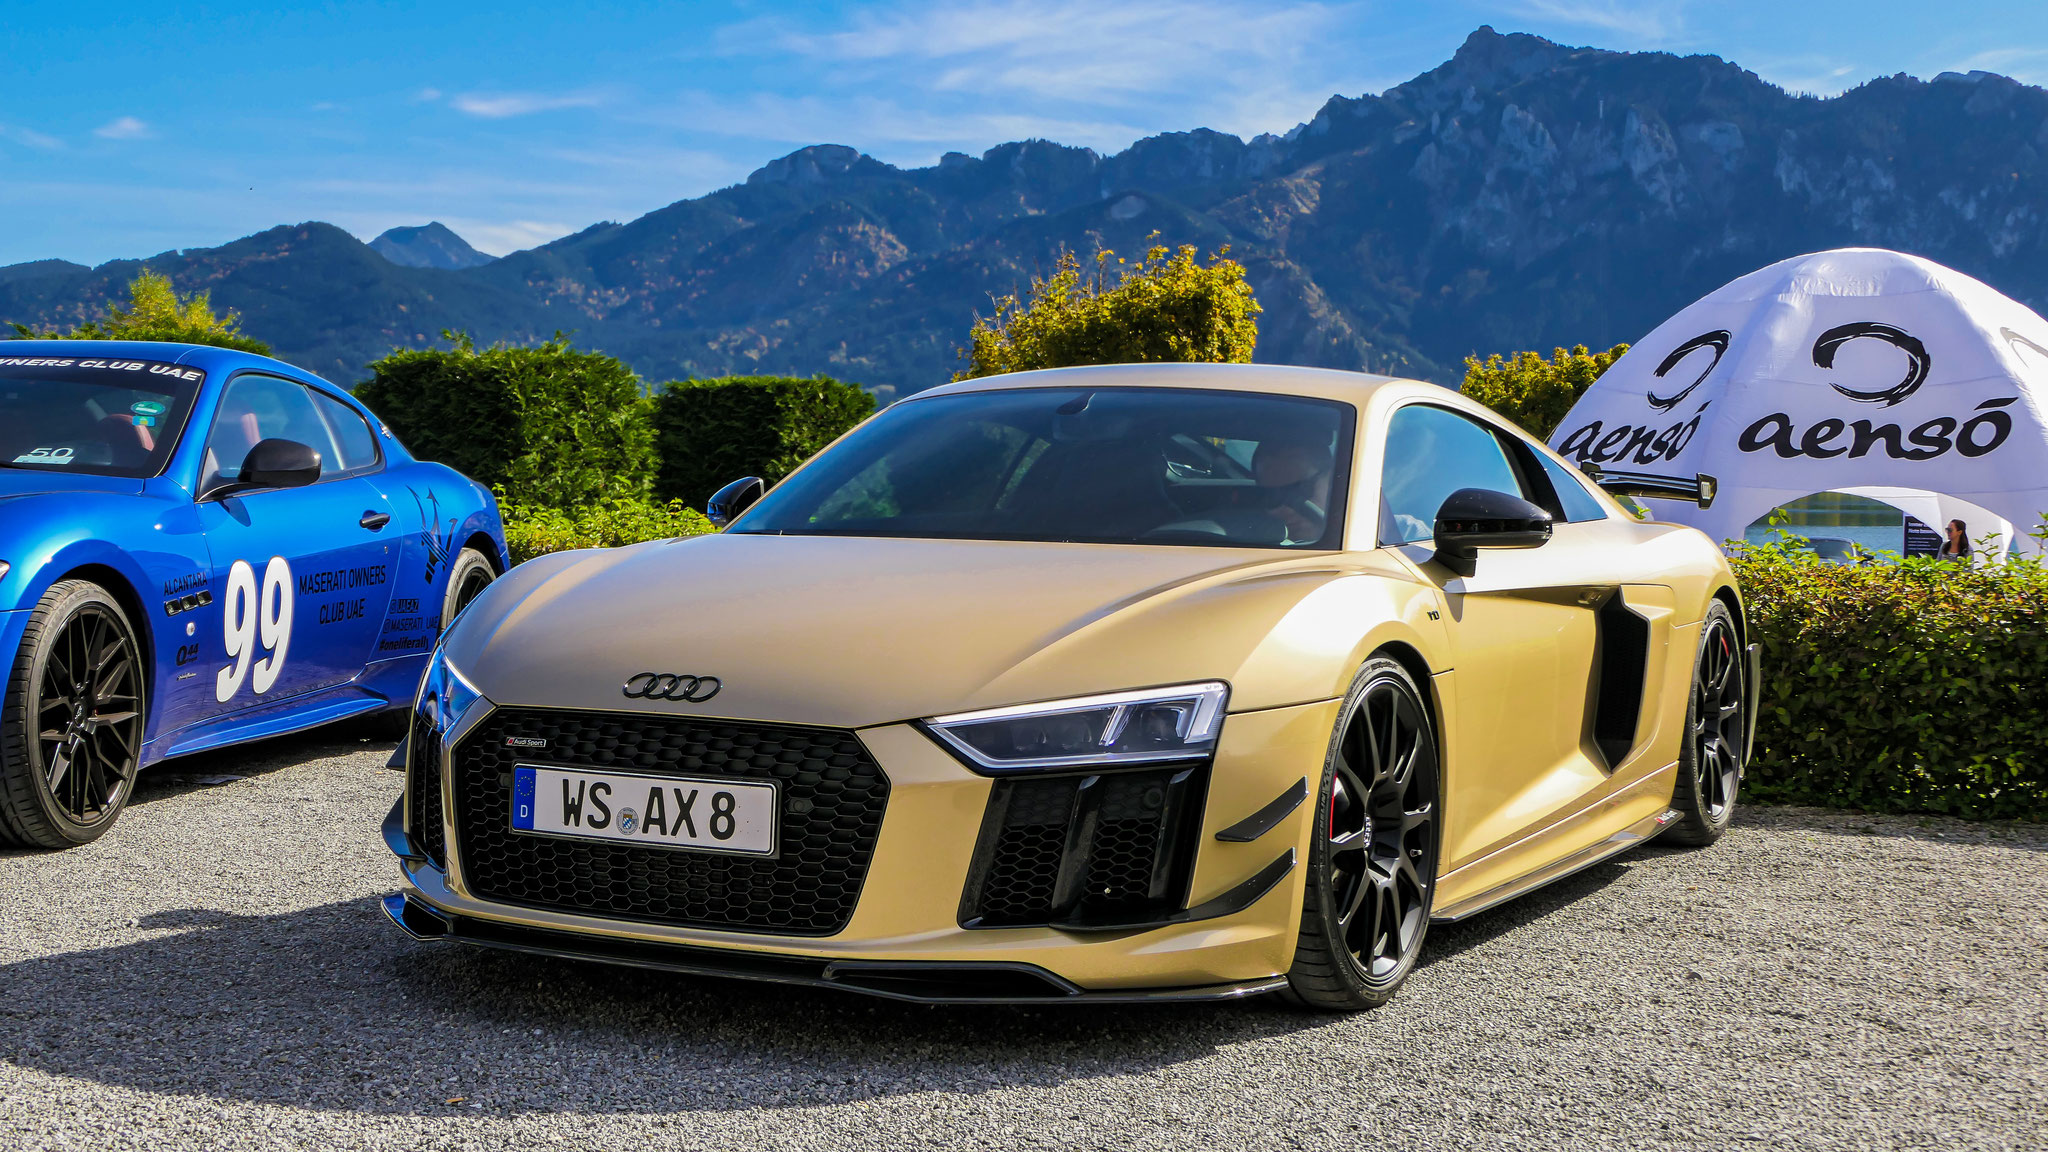 Audi R8 V10 Performance Parts - WS-AX-8